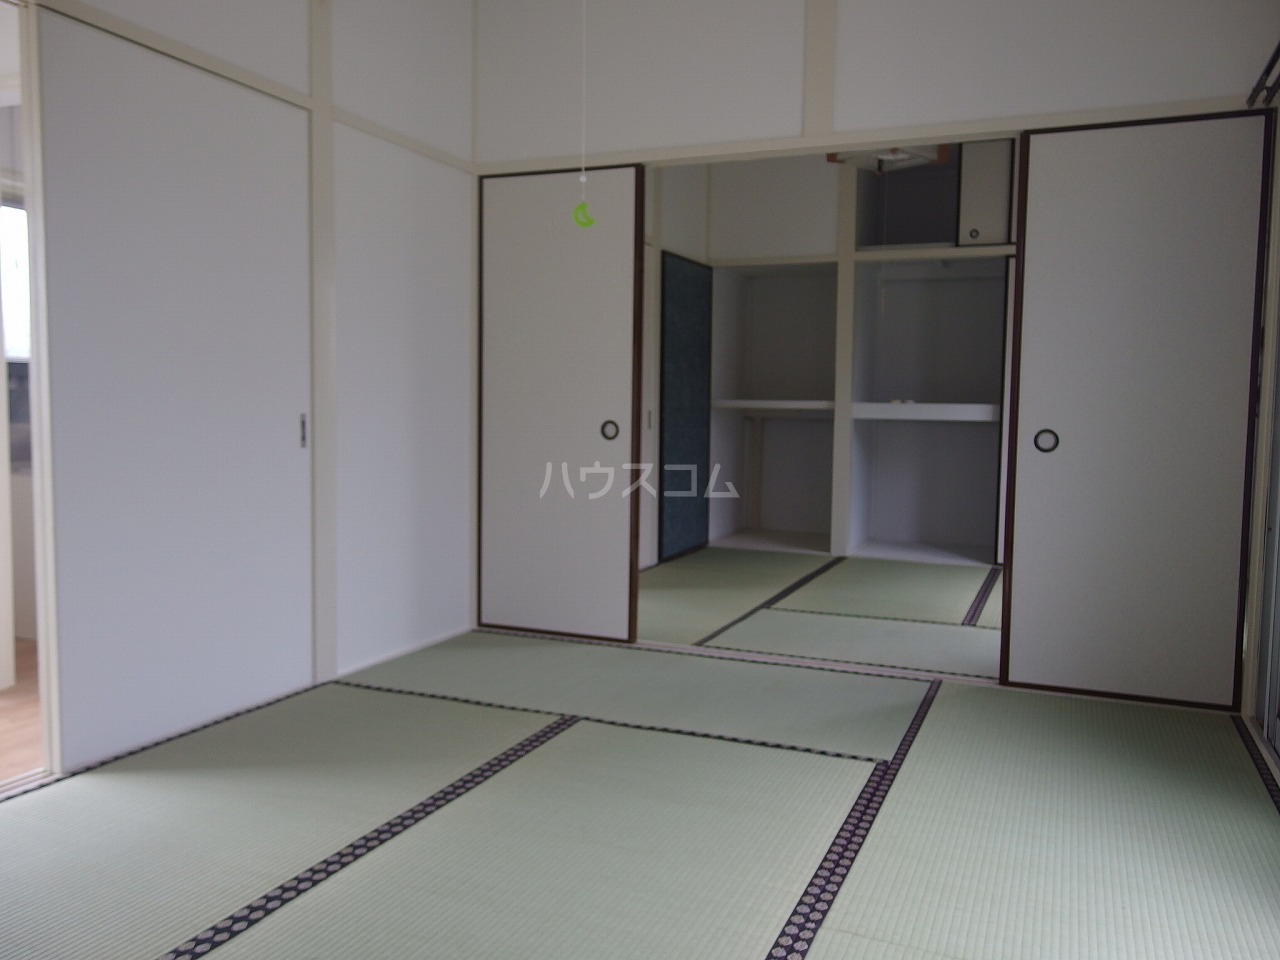 軽辺貸家 B号棟の居室